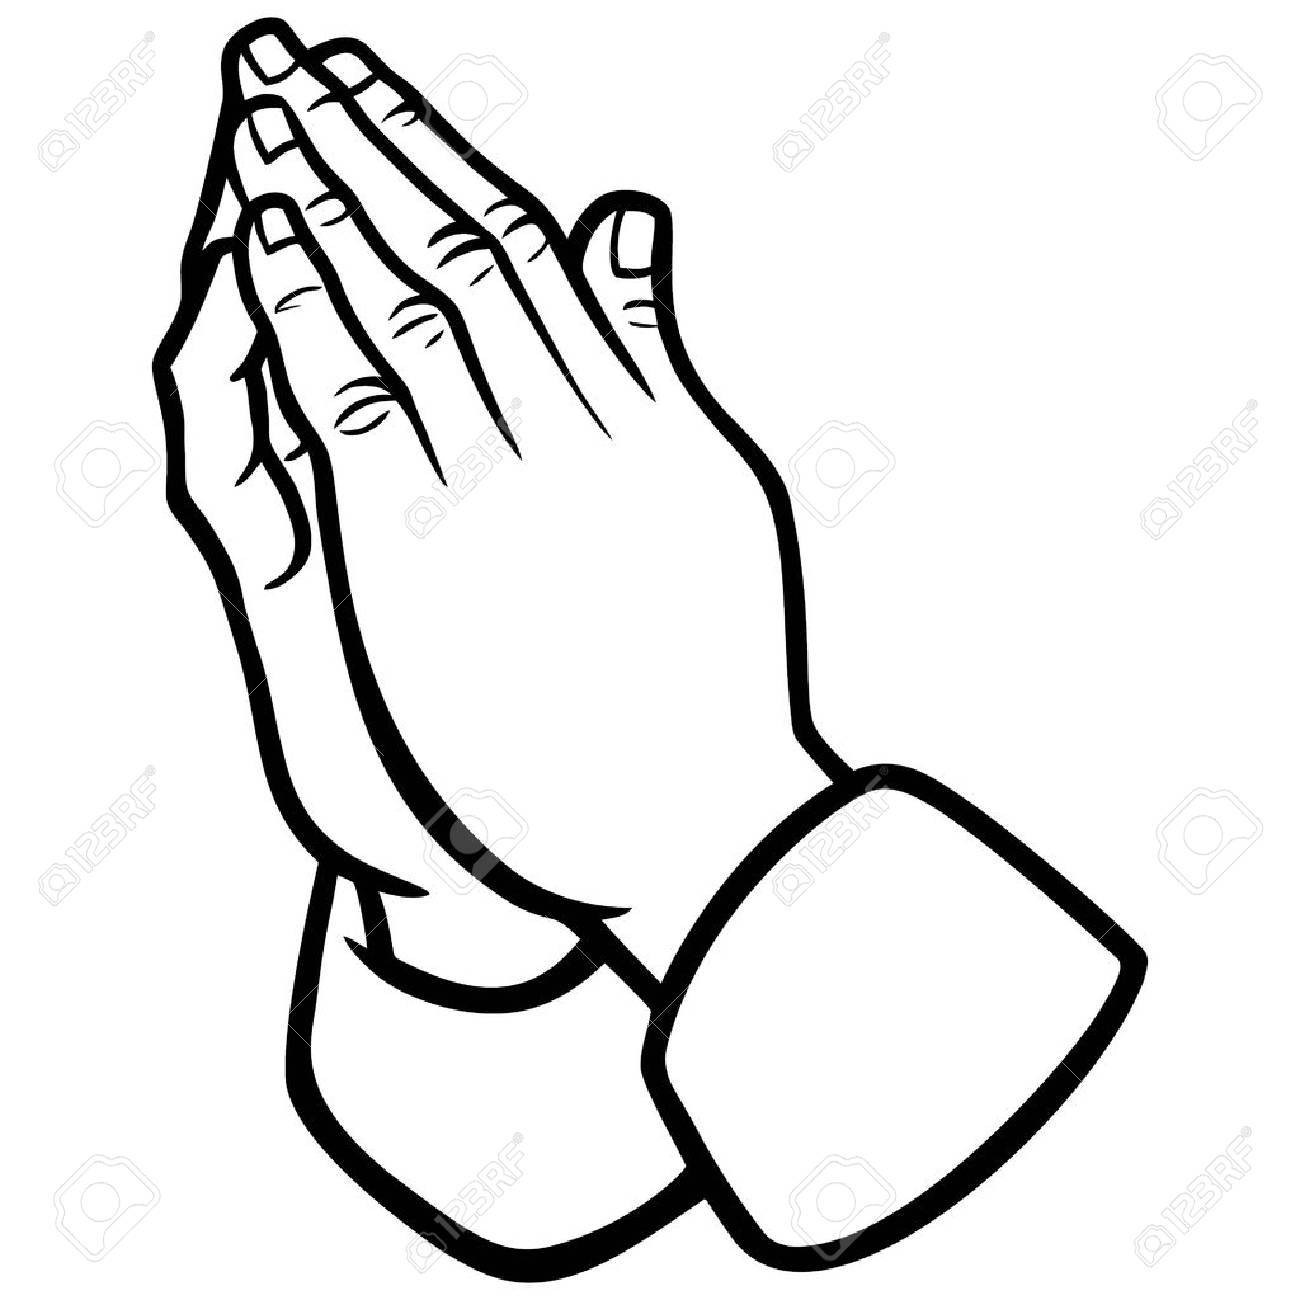 1300x1300 61903888 Praying Hands Illustration Vector 1